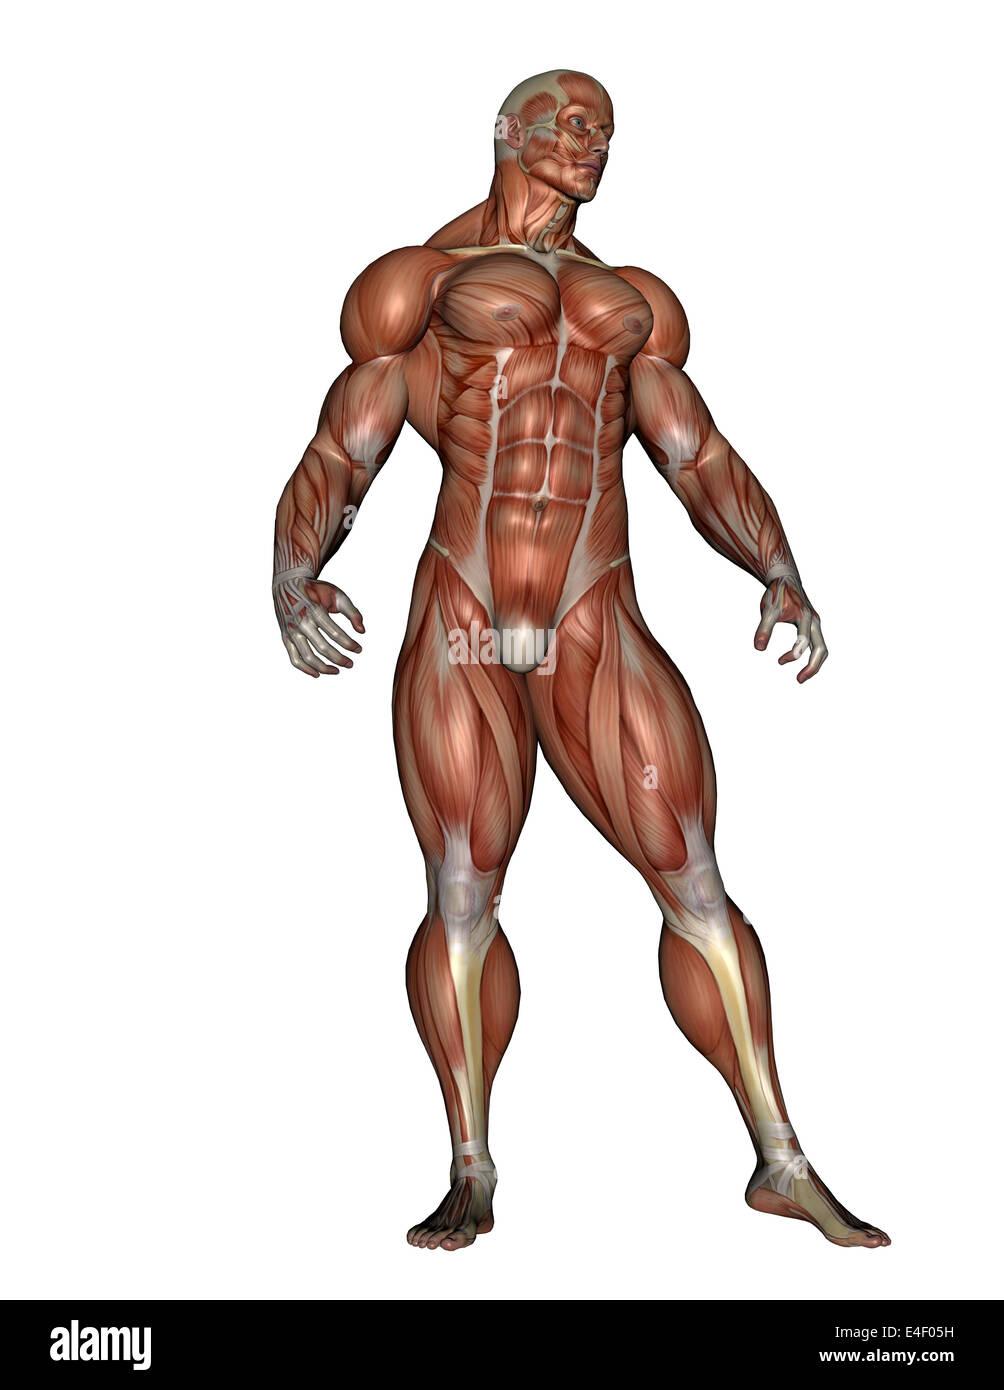 Hombre de pie muscular, aislado sobre fondo blanco. Imagen De Stock